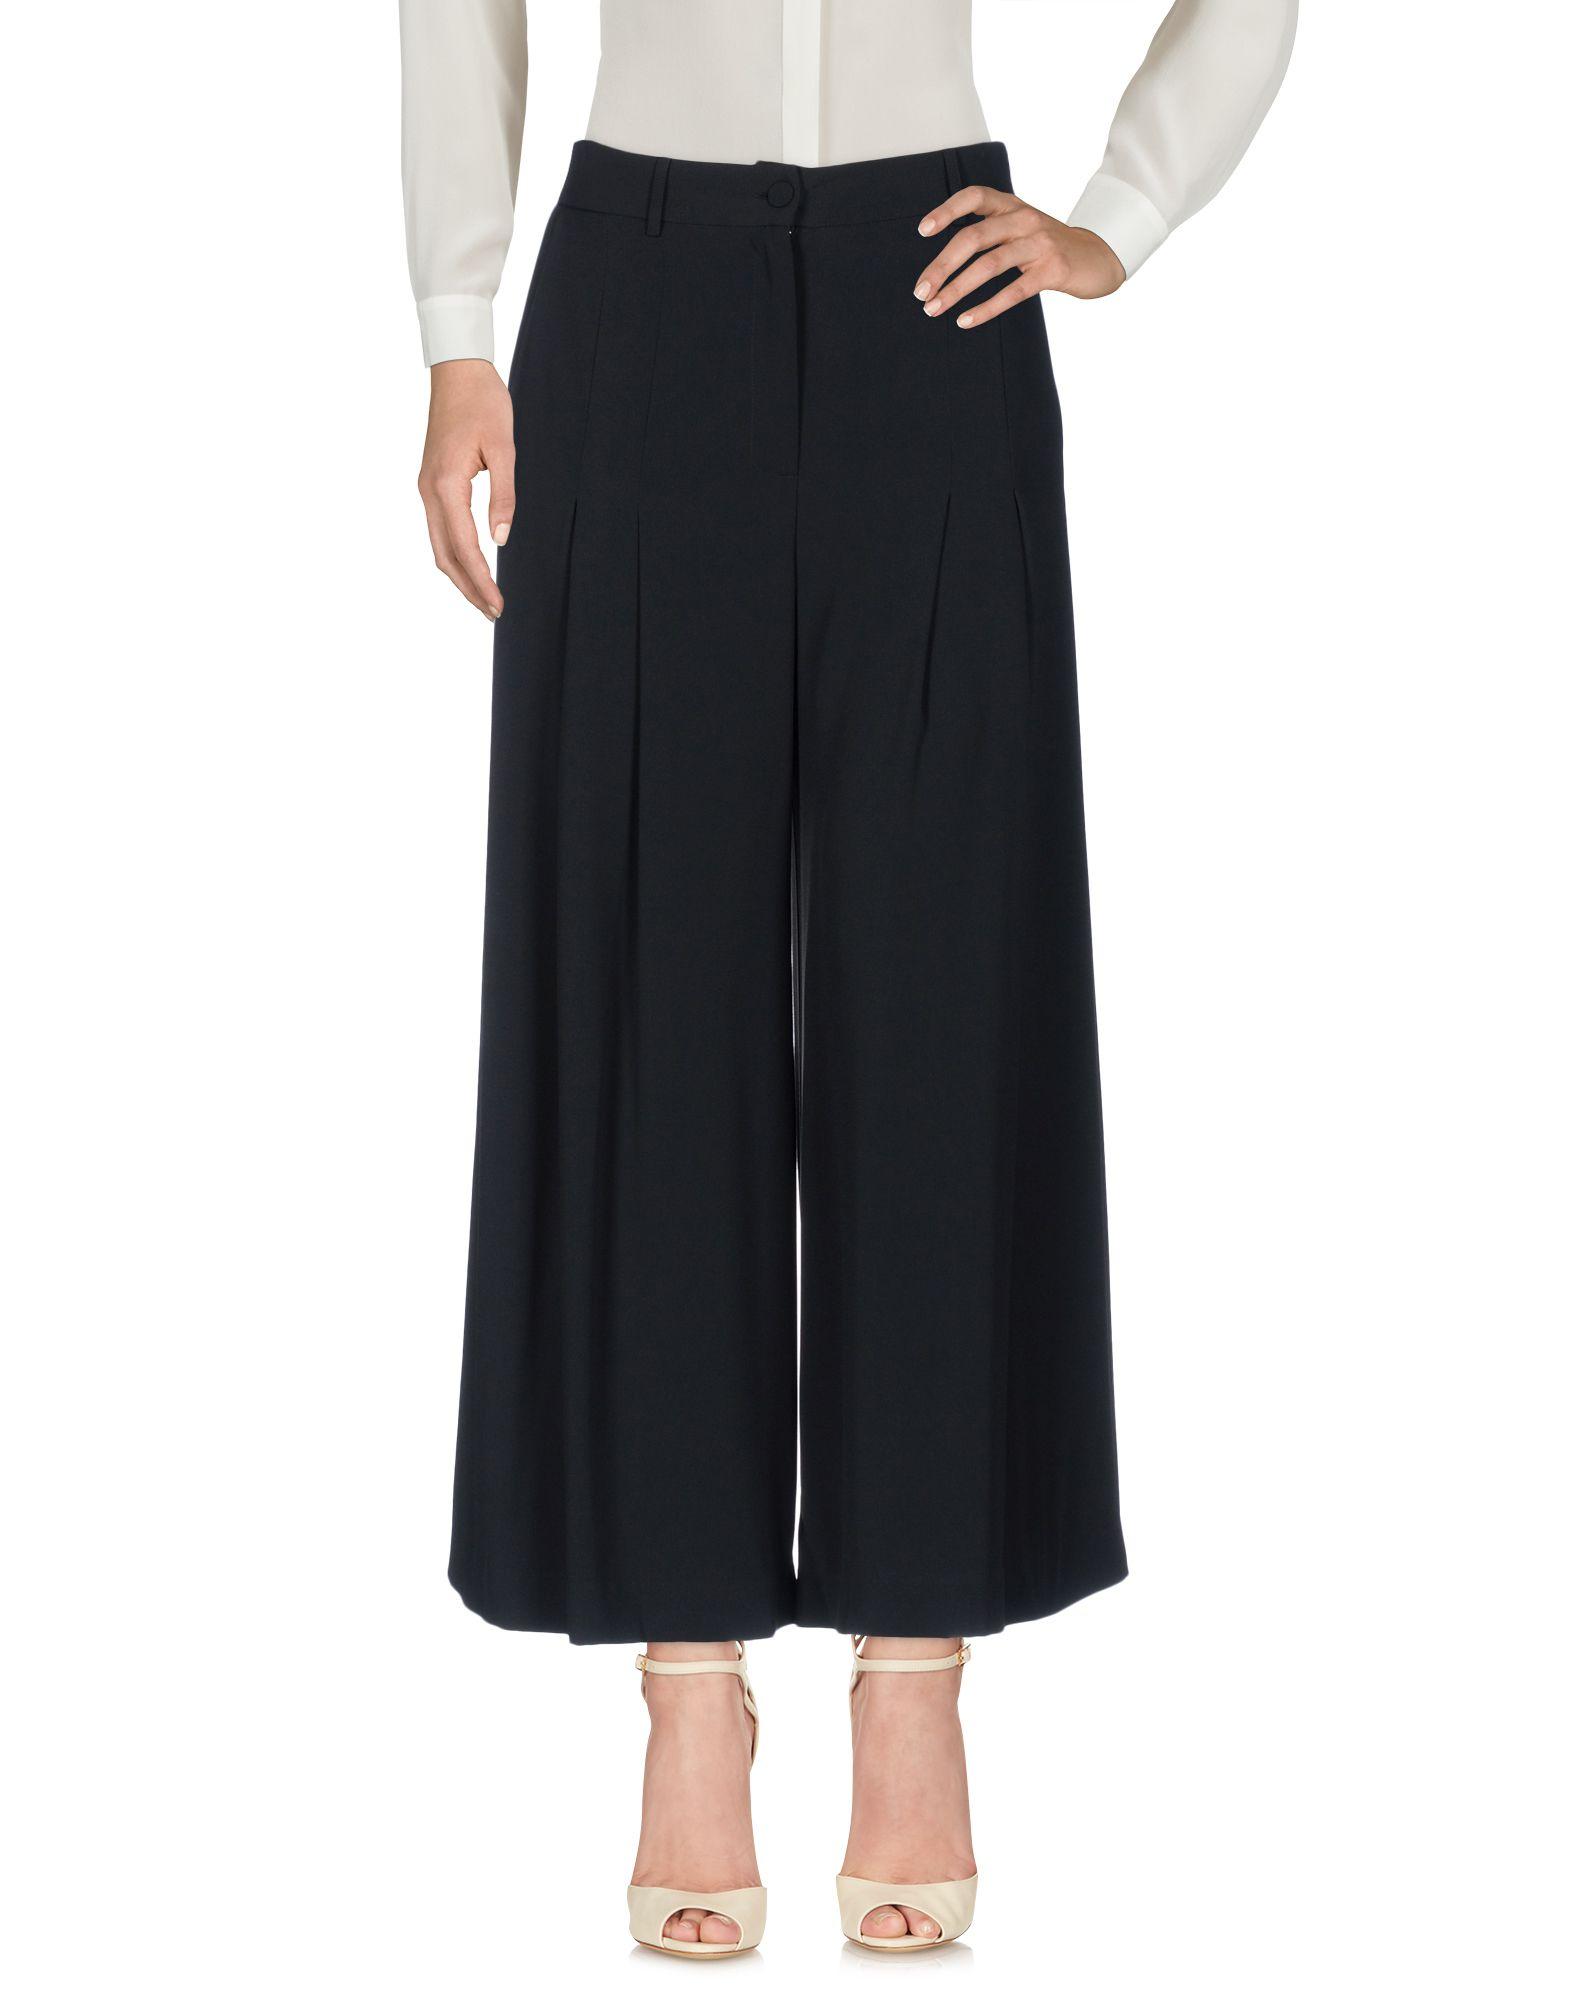 Pantalone Suoli Donna - Acquista online su gPH8hLVDF